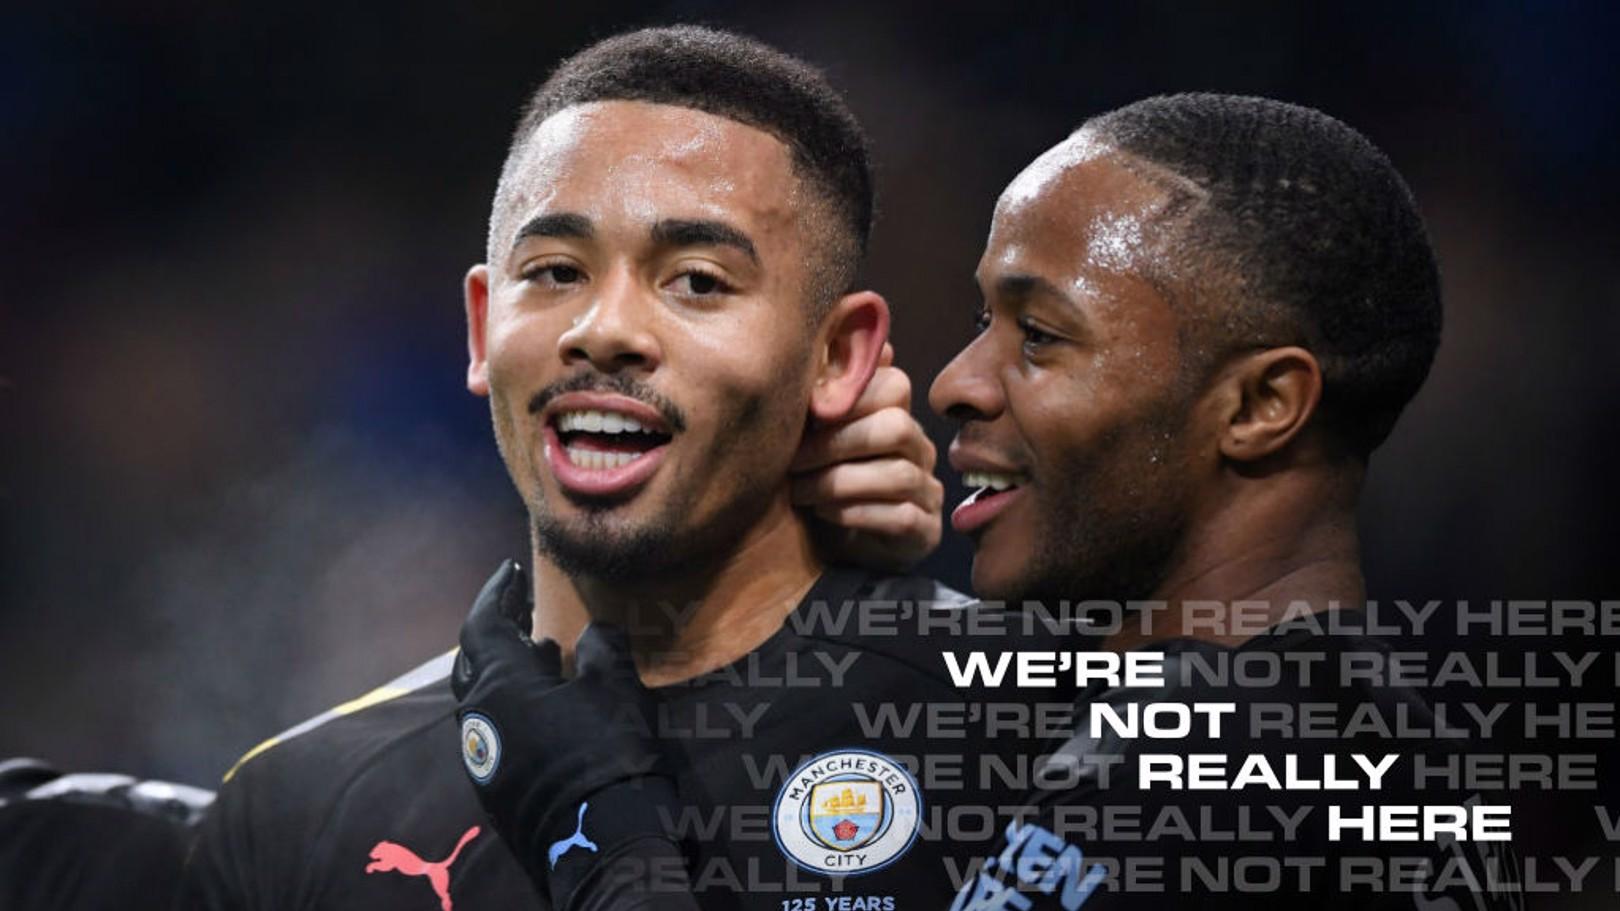 City Memimpin Di Eropa Dengan Jumlah Pemain yang Sudah Mencetak 20 Gol Musim Ini